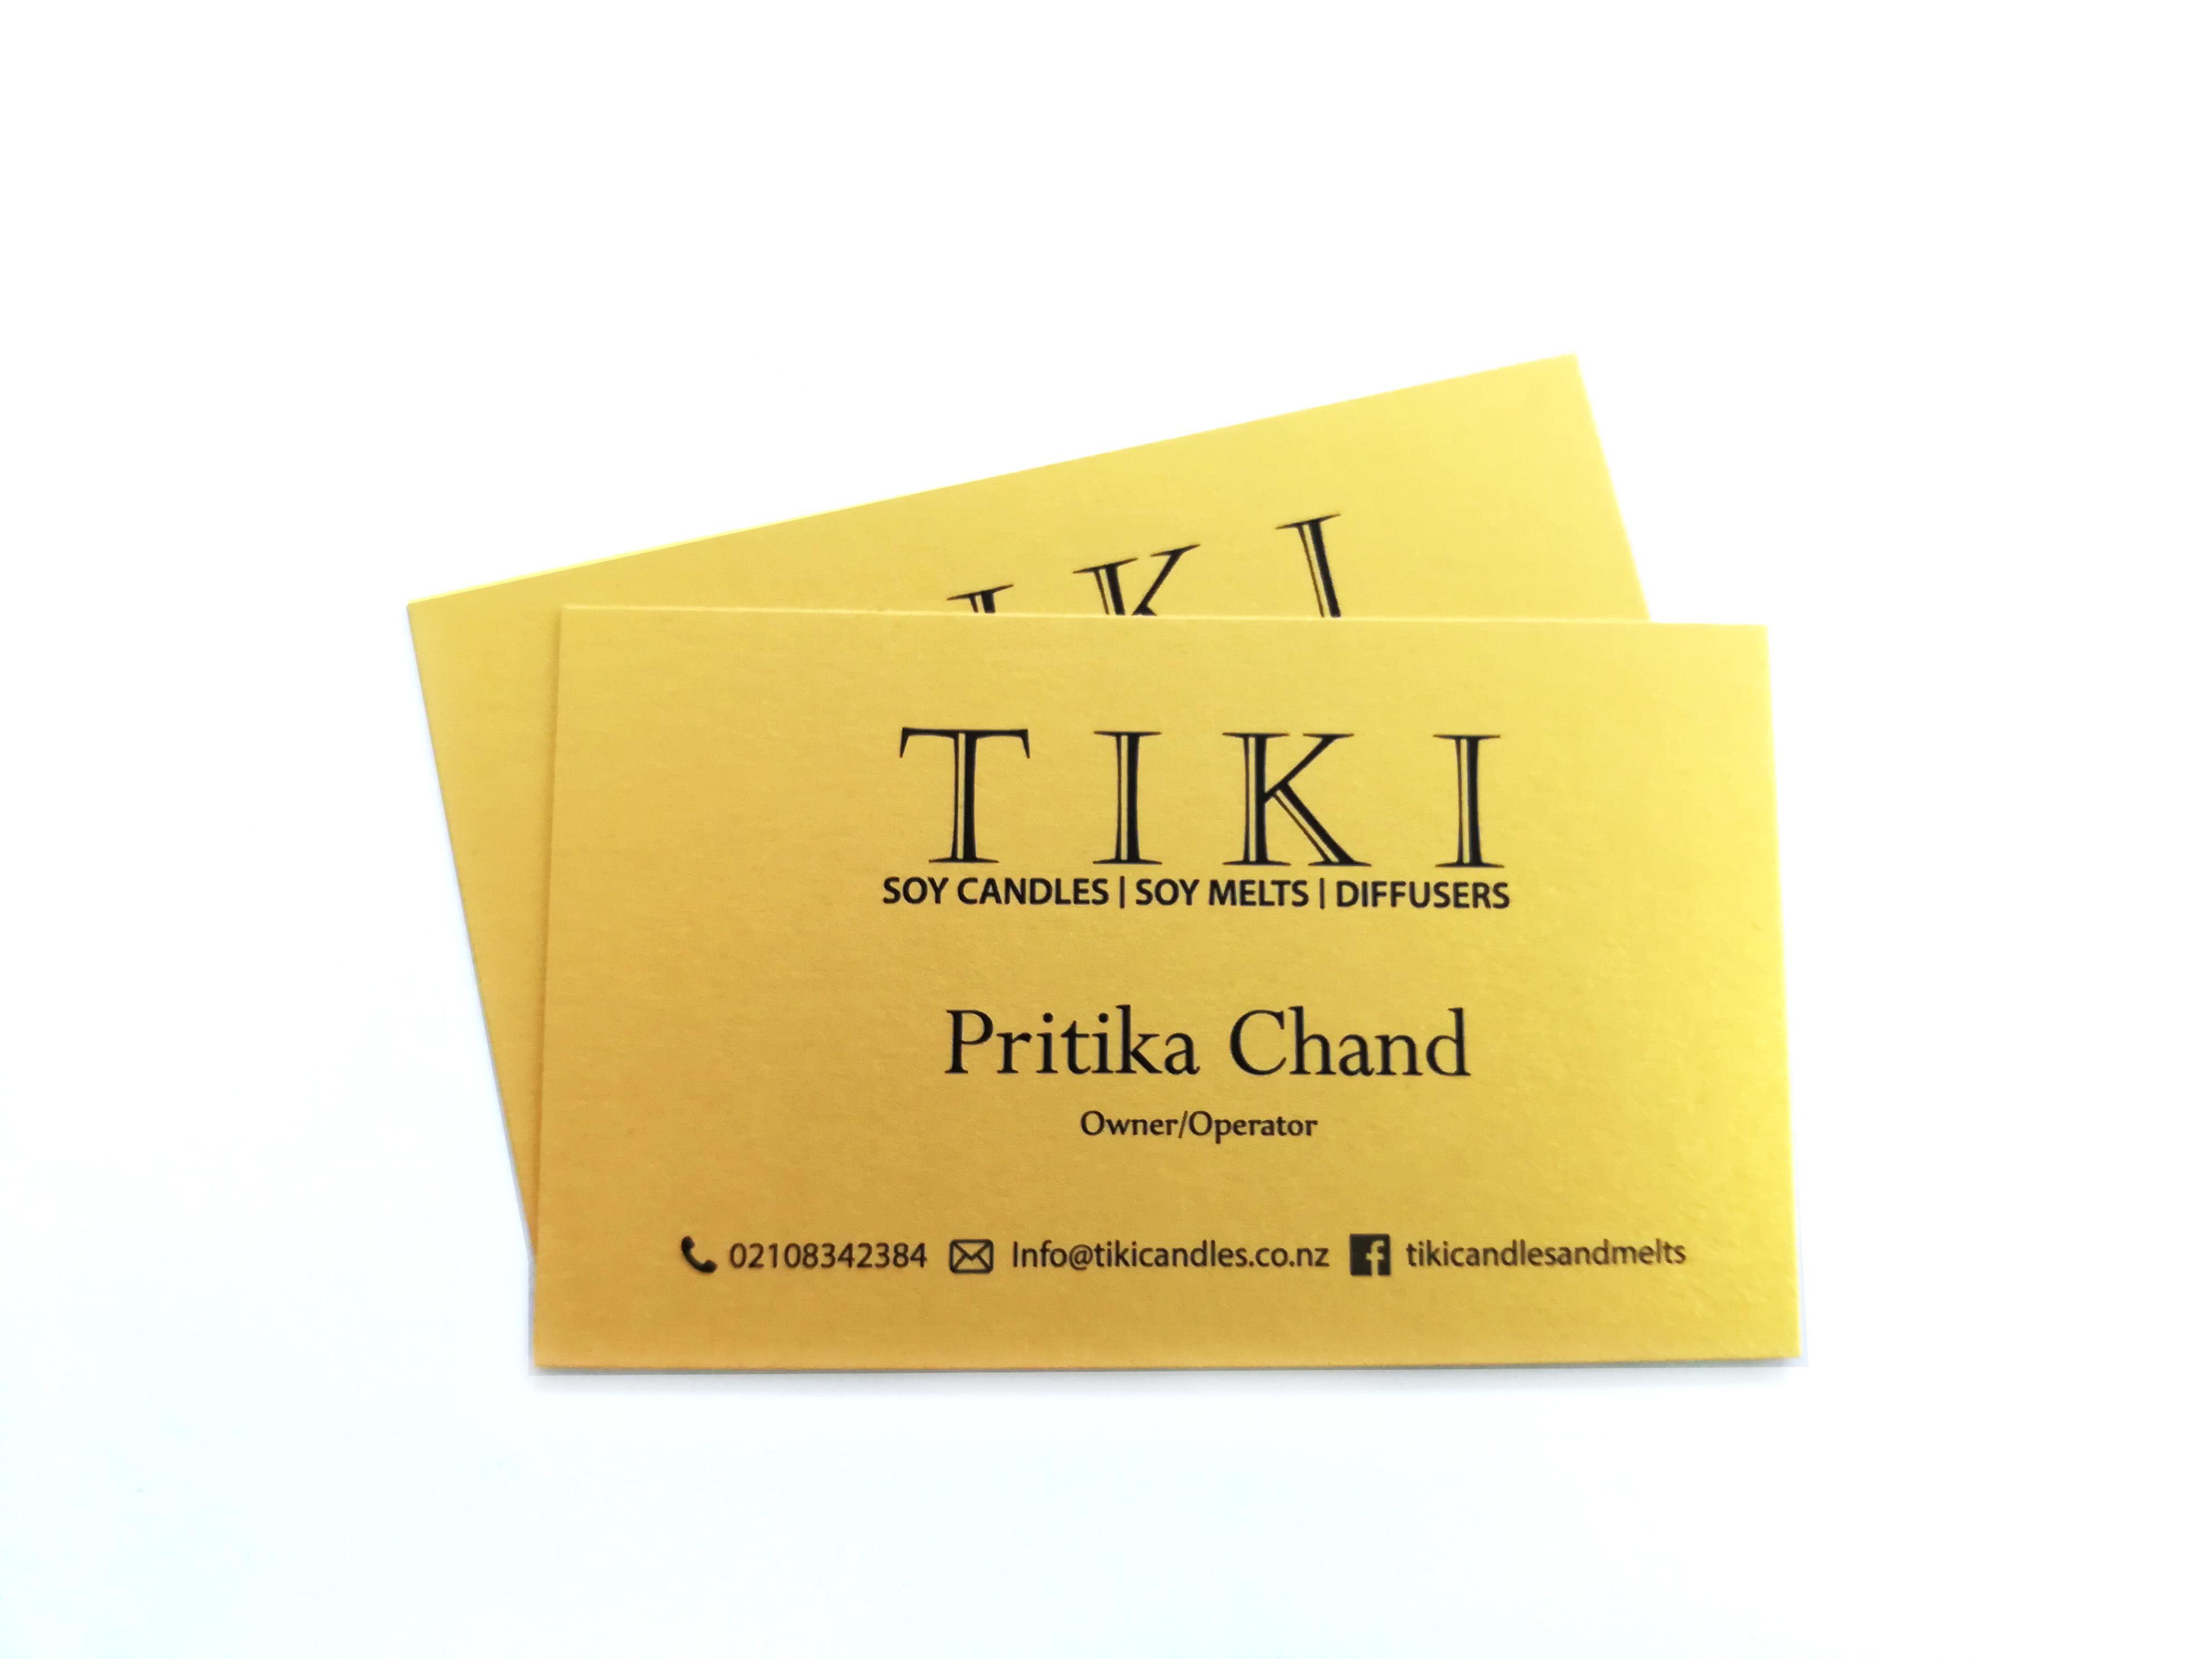 Business card printinglocal bestcheap business card printing business cards loyalty cards gift cards reheart Gallery